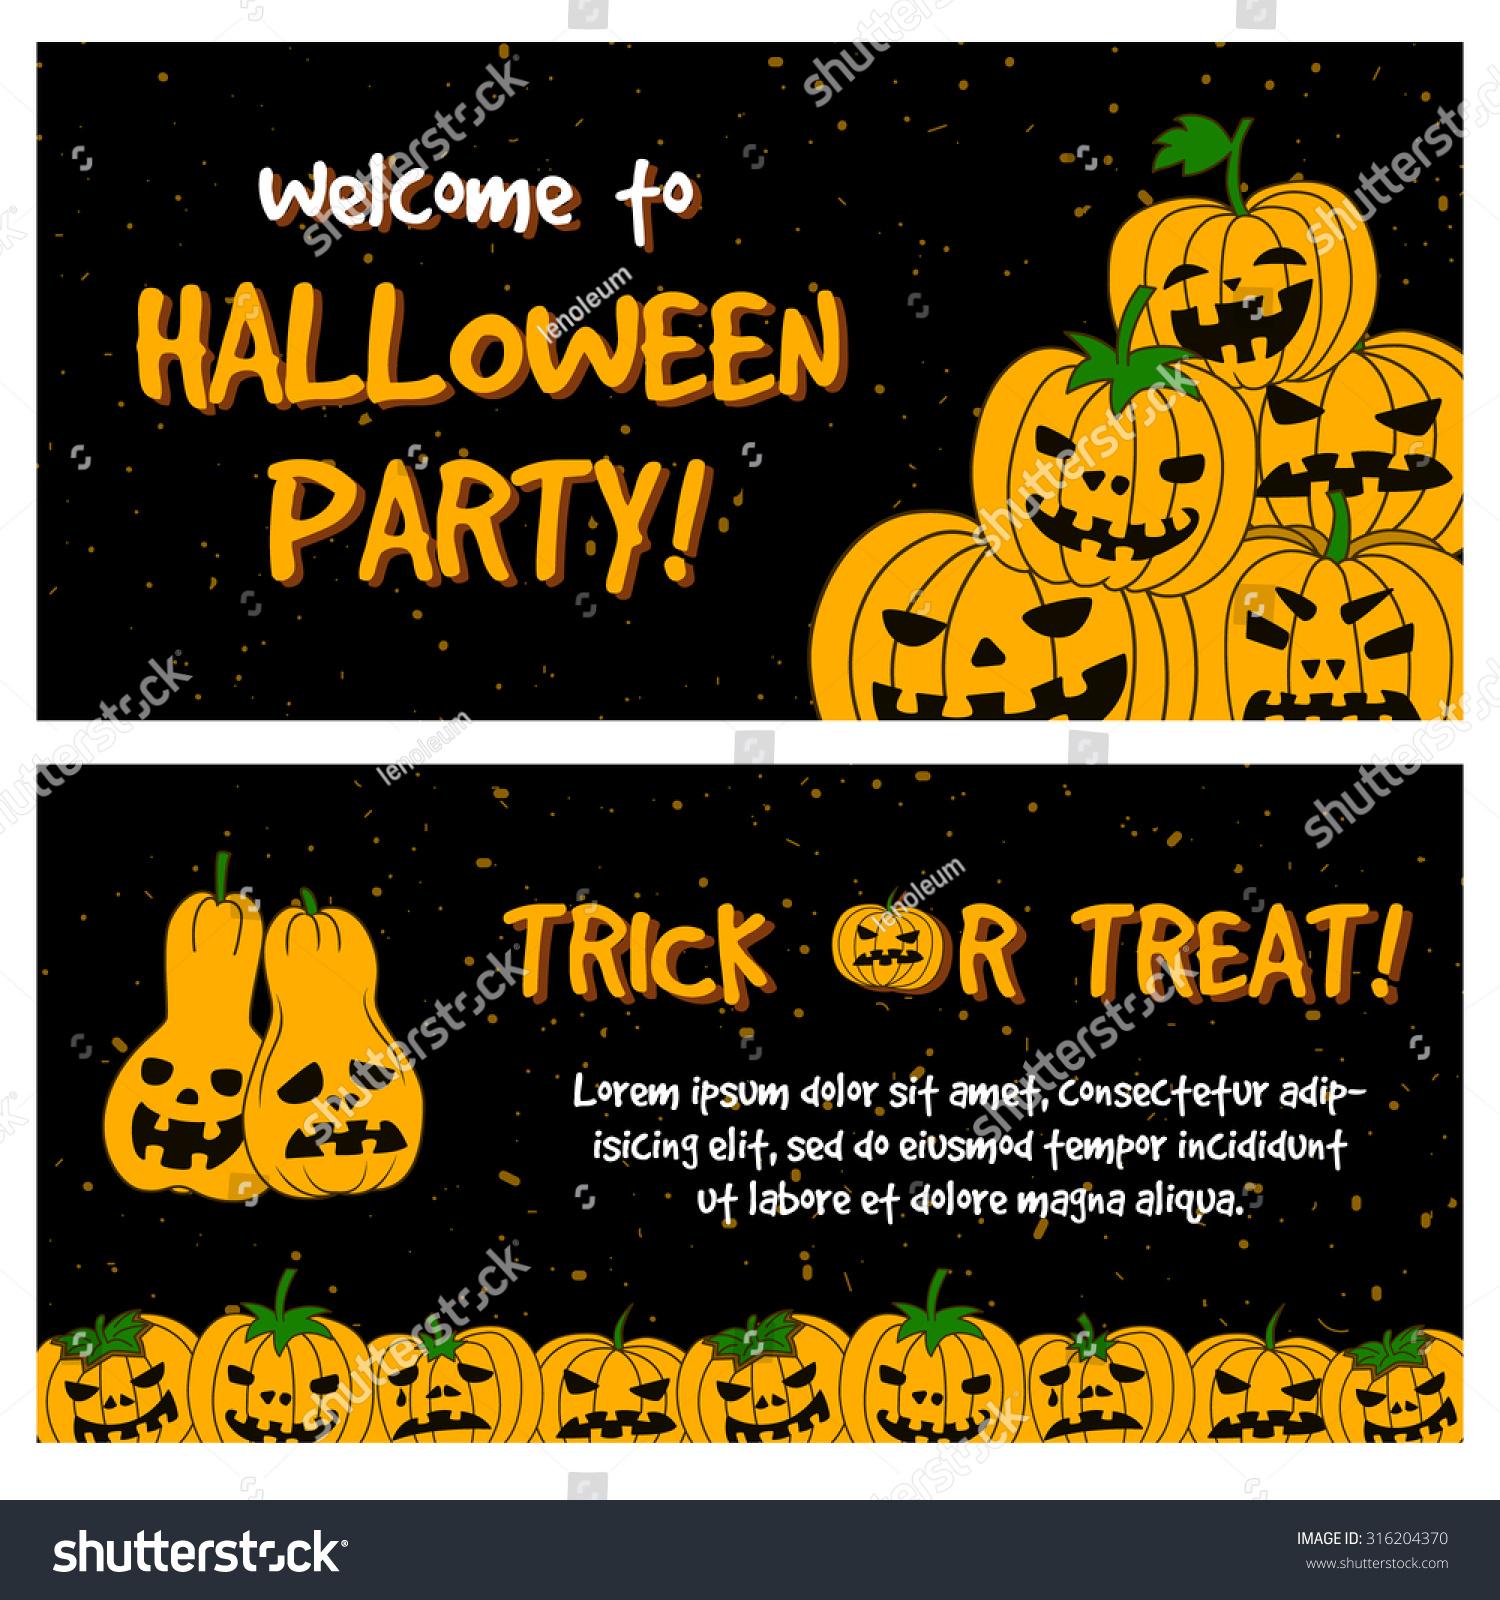 Halloween Party Horizontal Template Banner Poster Stock Vector (2018 ...